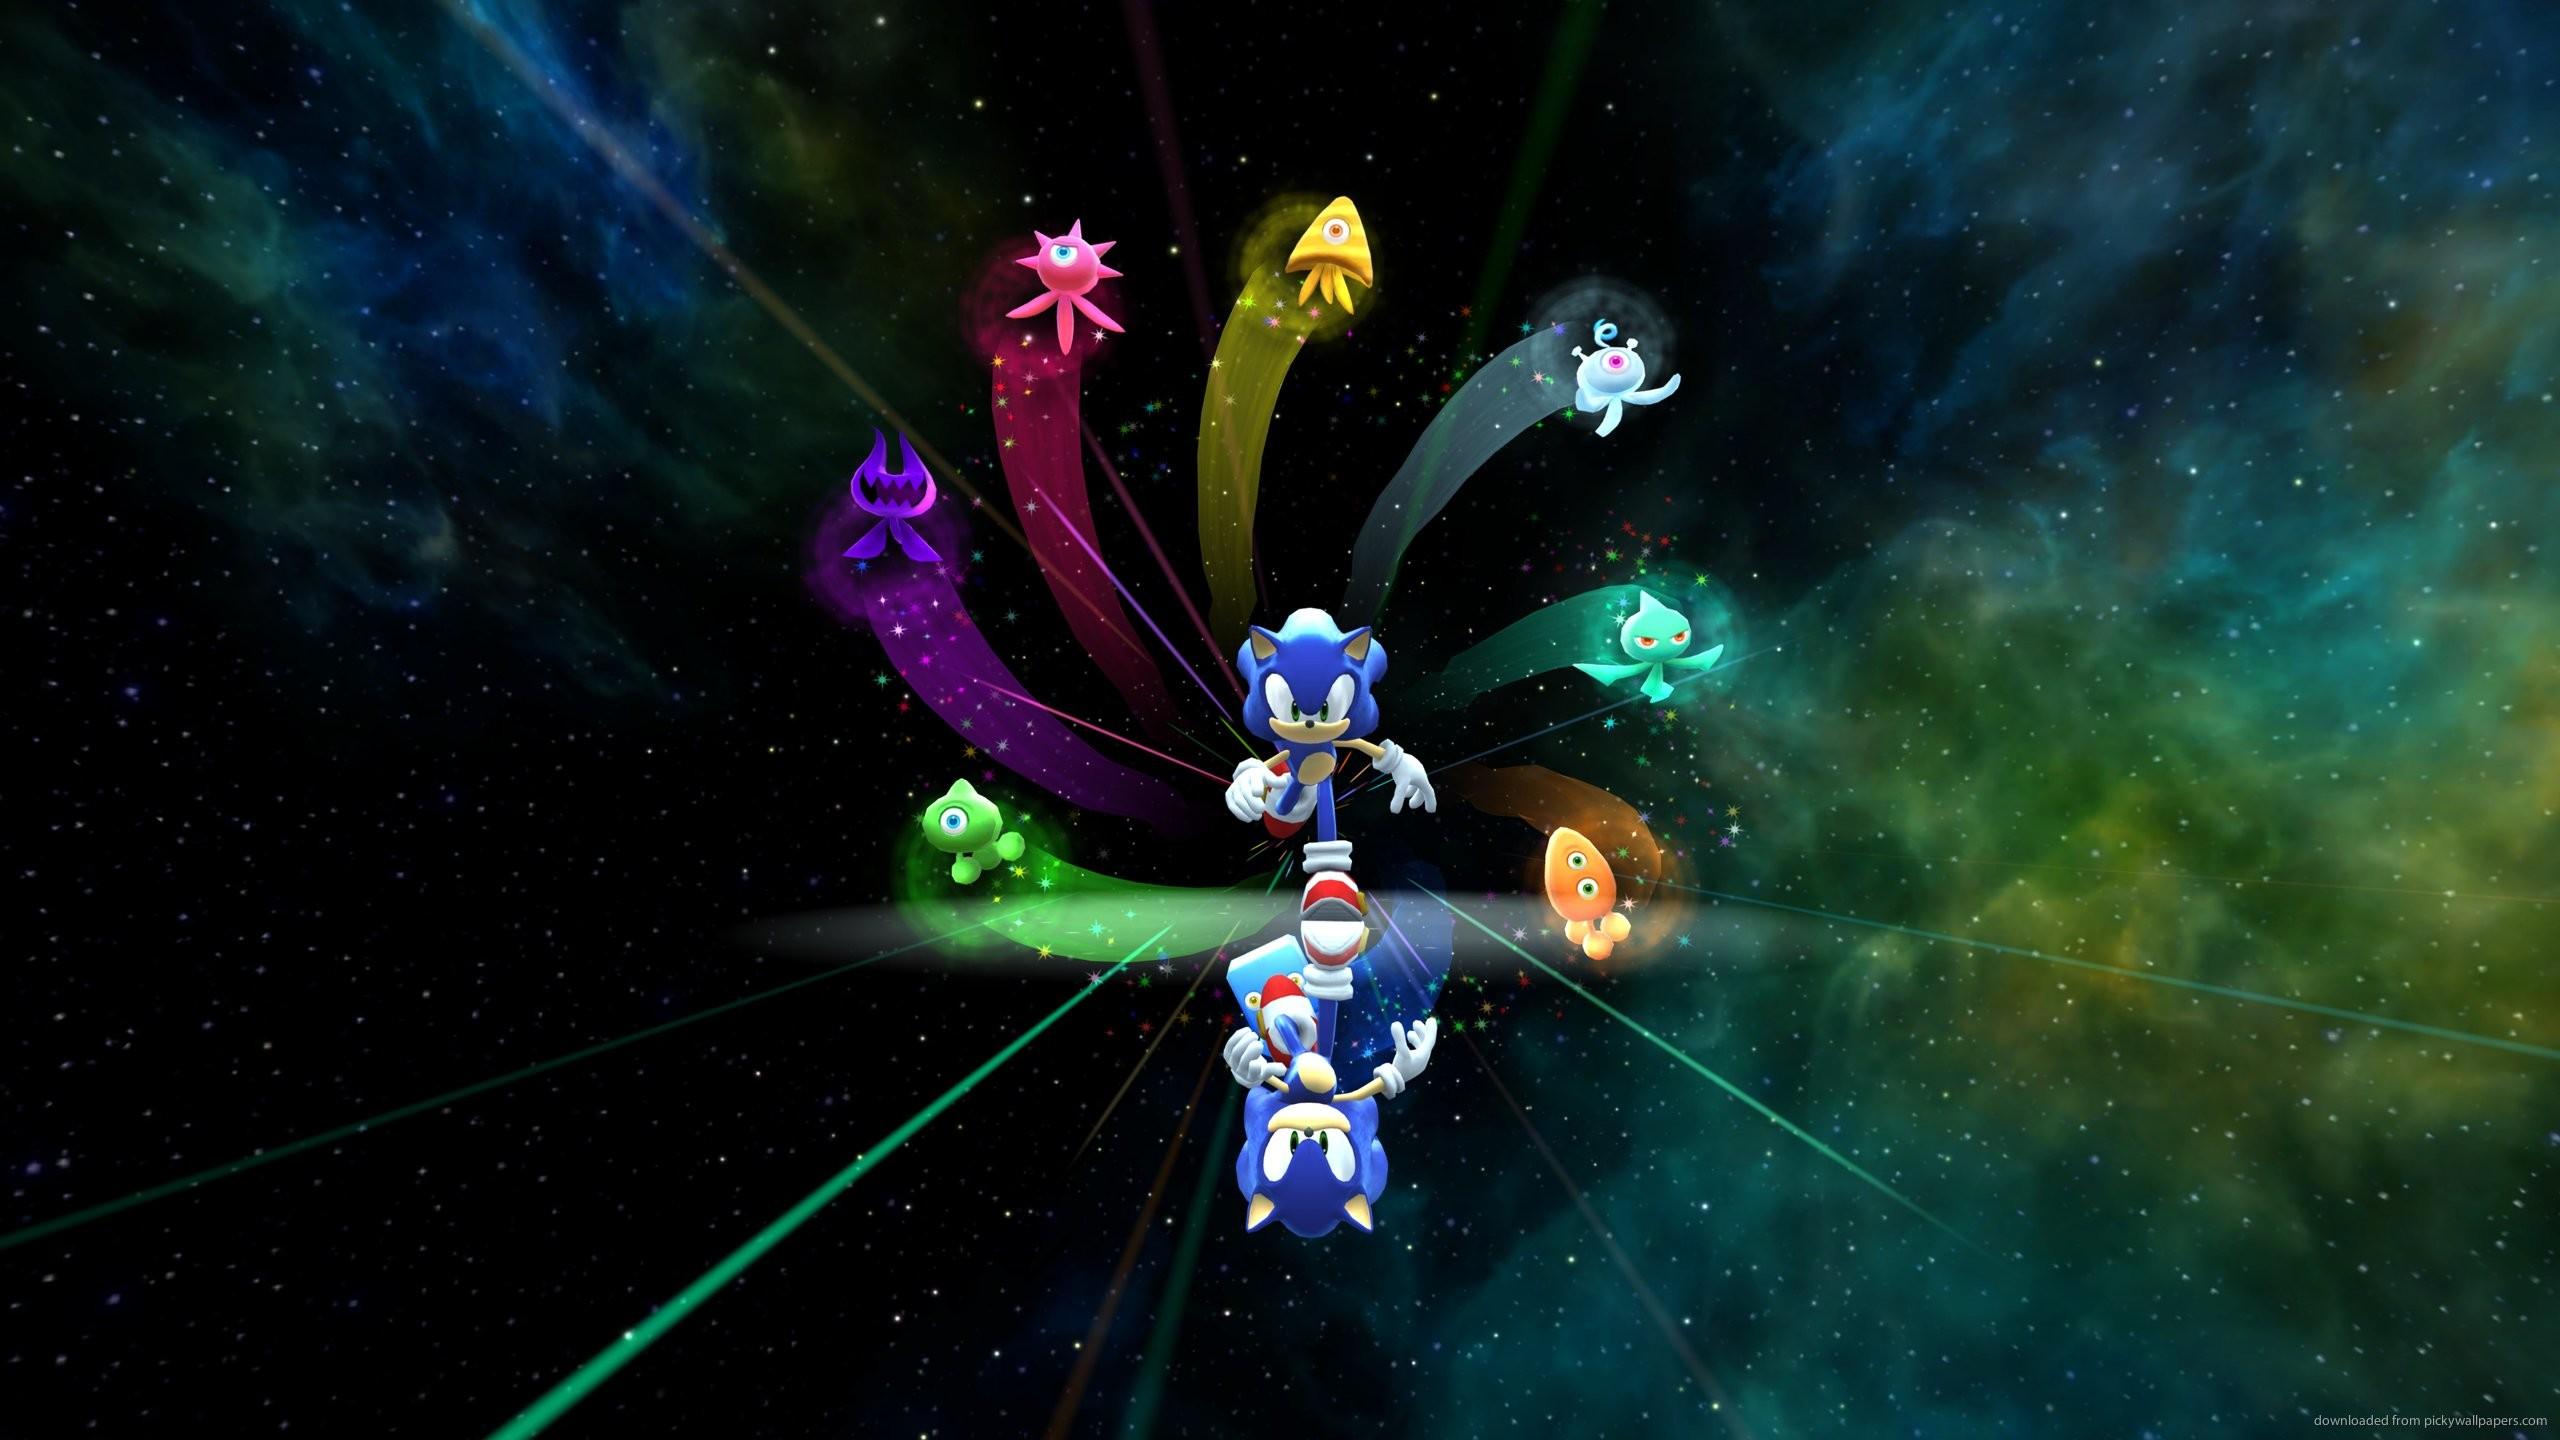 Dark Sonic Wallpapers 71 Images